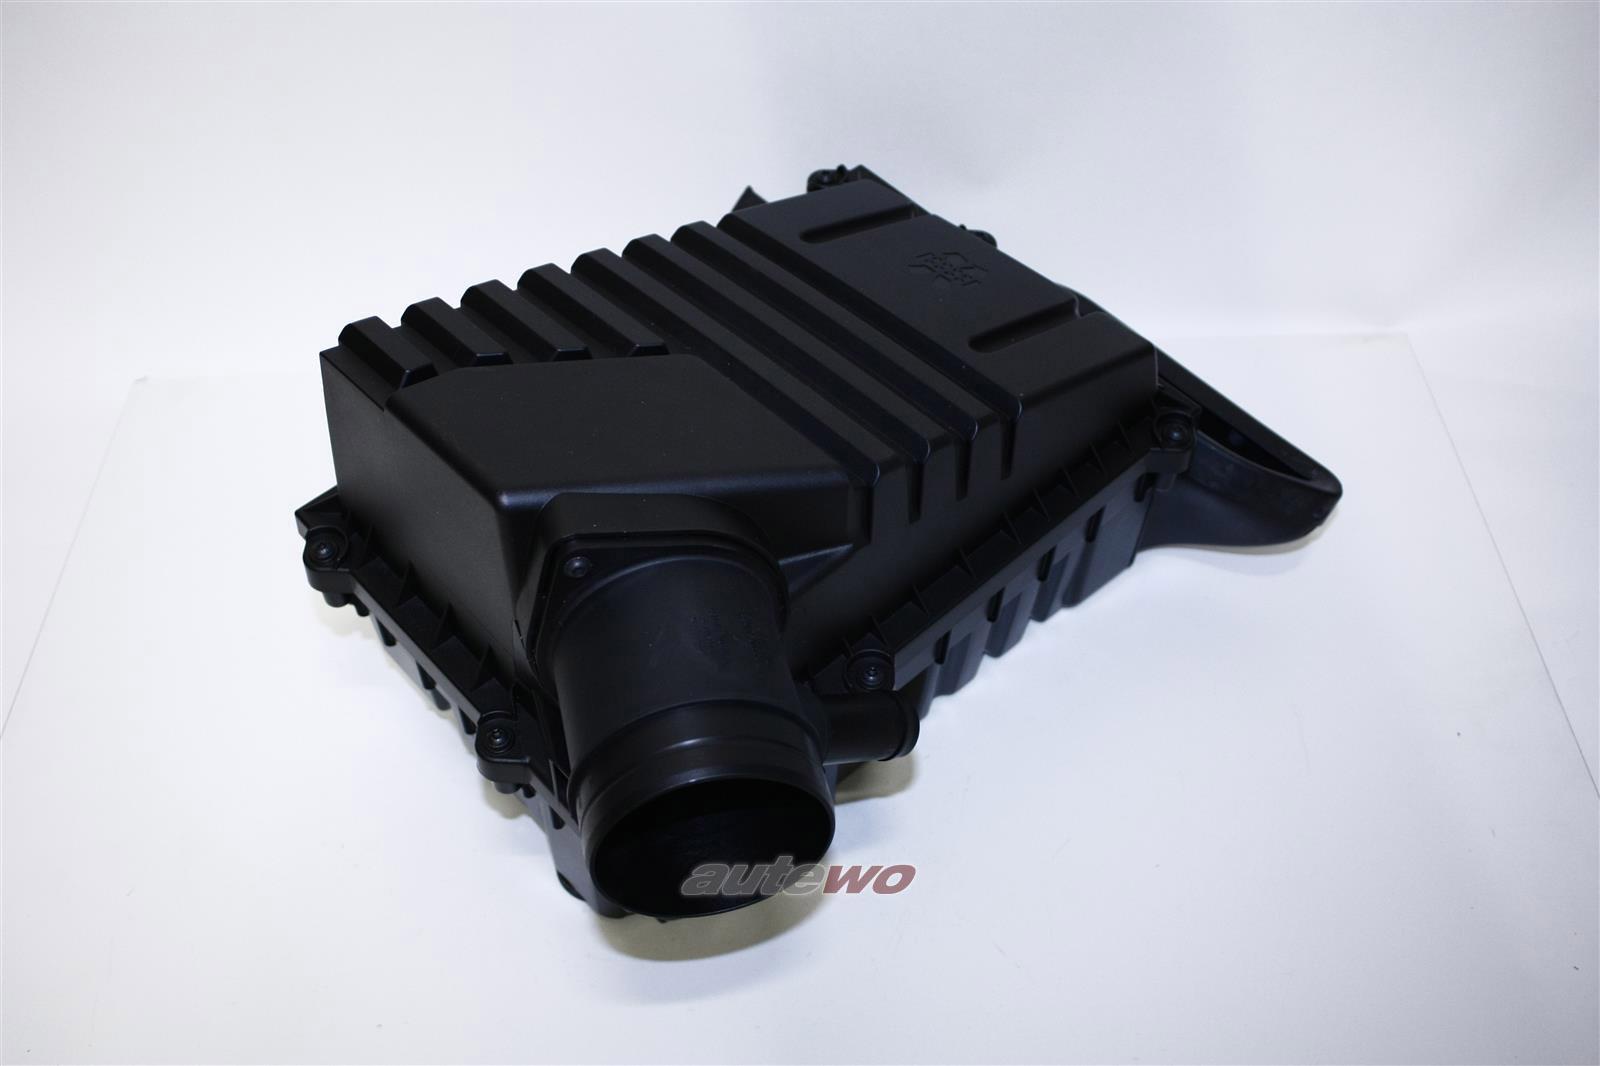 8J0129601C 8J0129607C NEU Audi RS3/TTRS 2.5l 340-360PS Luftfilterkasten